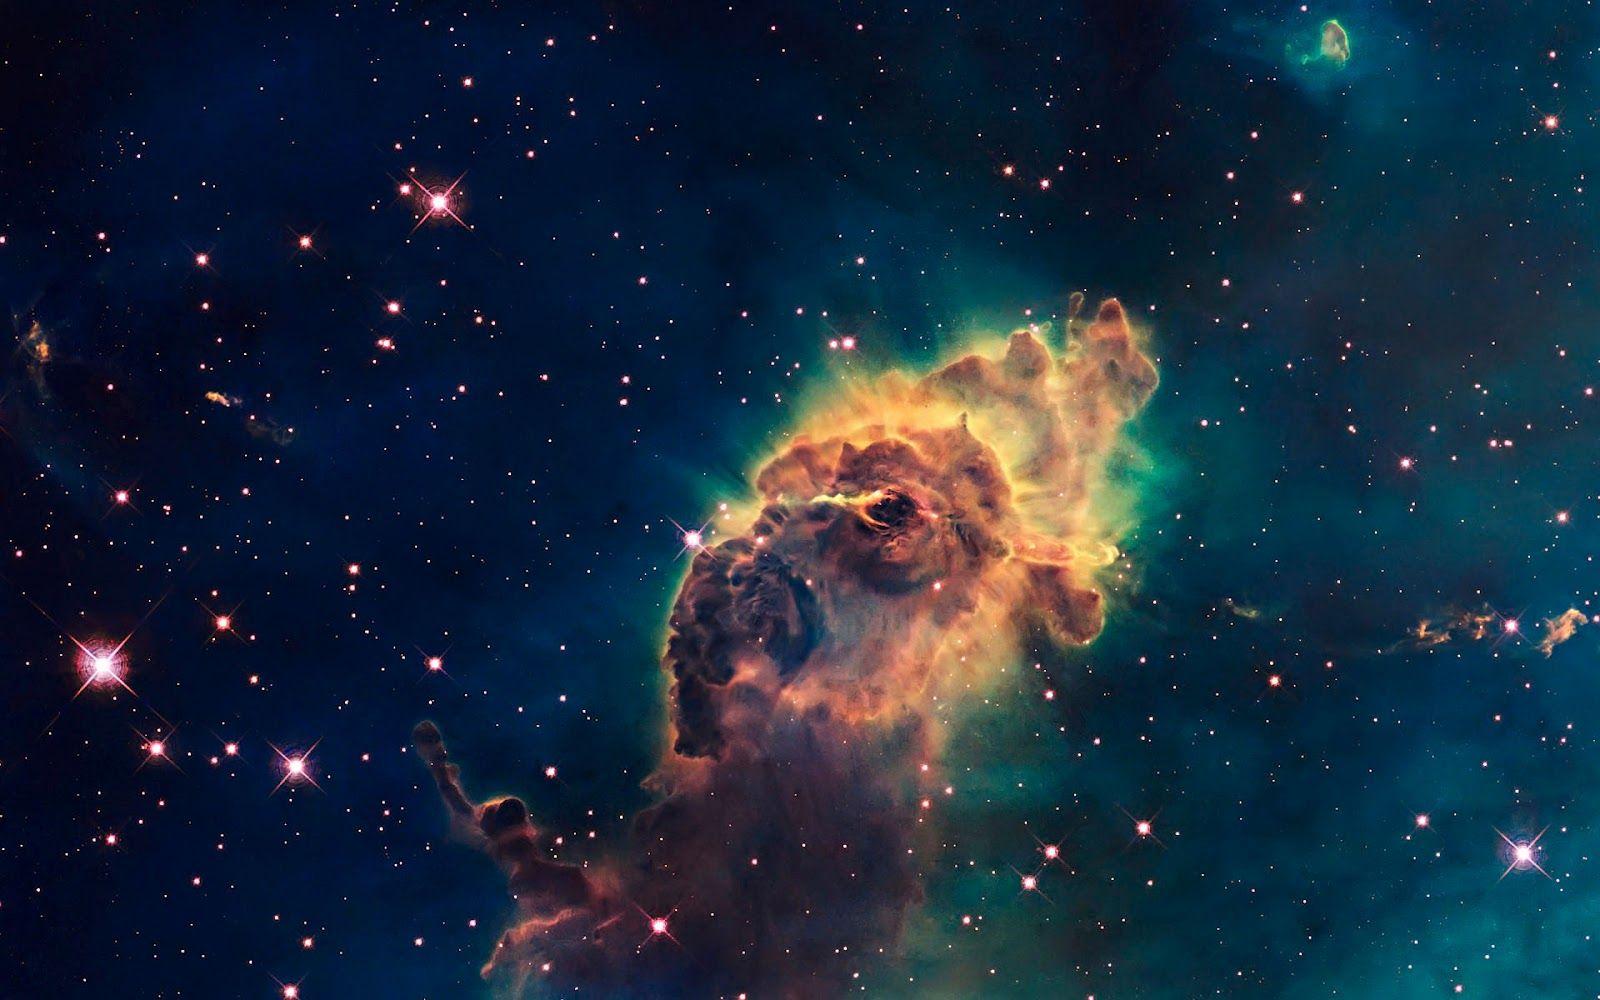 Galaxy Wallpaper Hd 8182 1600x1000 Px Hdwallsource Com Nebula Wallpaper Hd Galaxy Wallpaper Galaxy Wallpaper